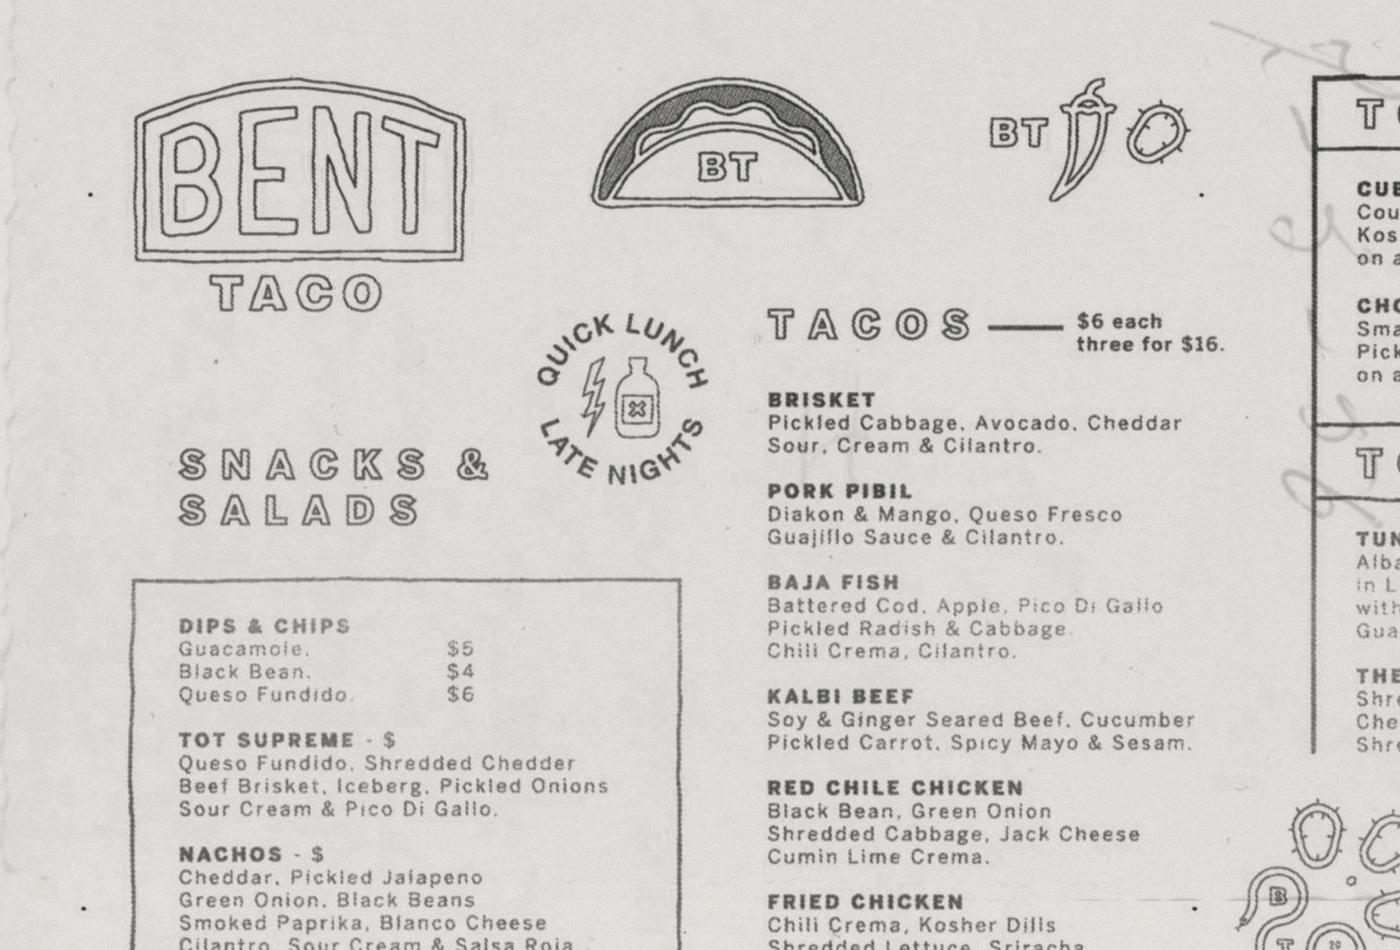 menus-menu-taco-bent-bentatco-vacaliebres-branding